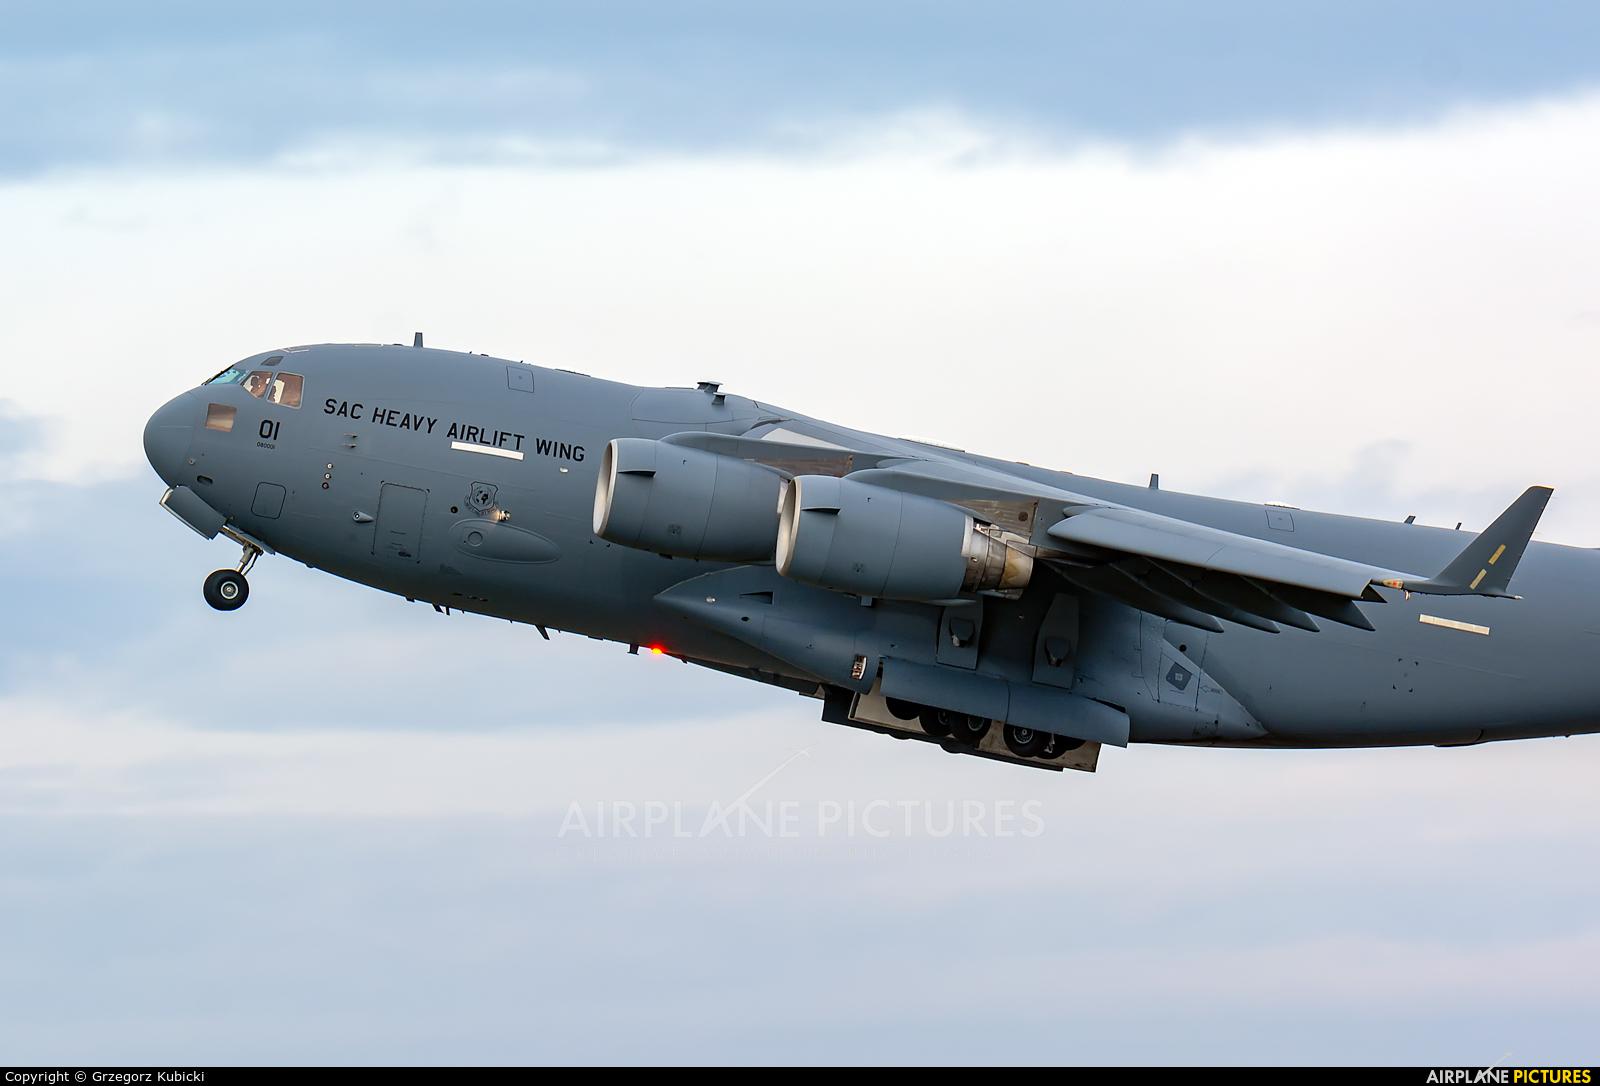 Hungary - Air Force 01 aircraft at Wrocław - Copernicus